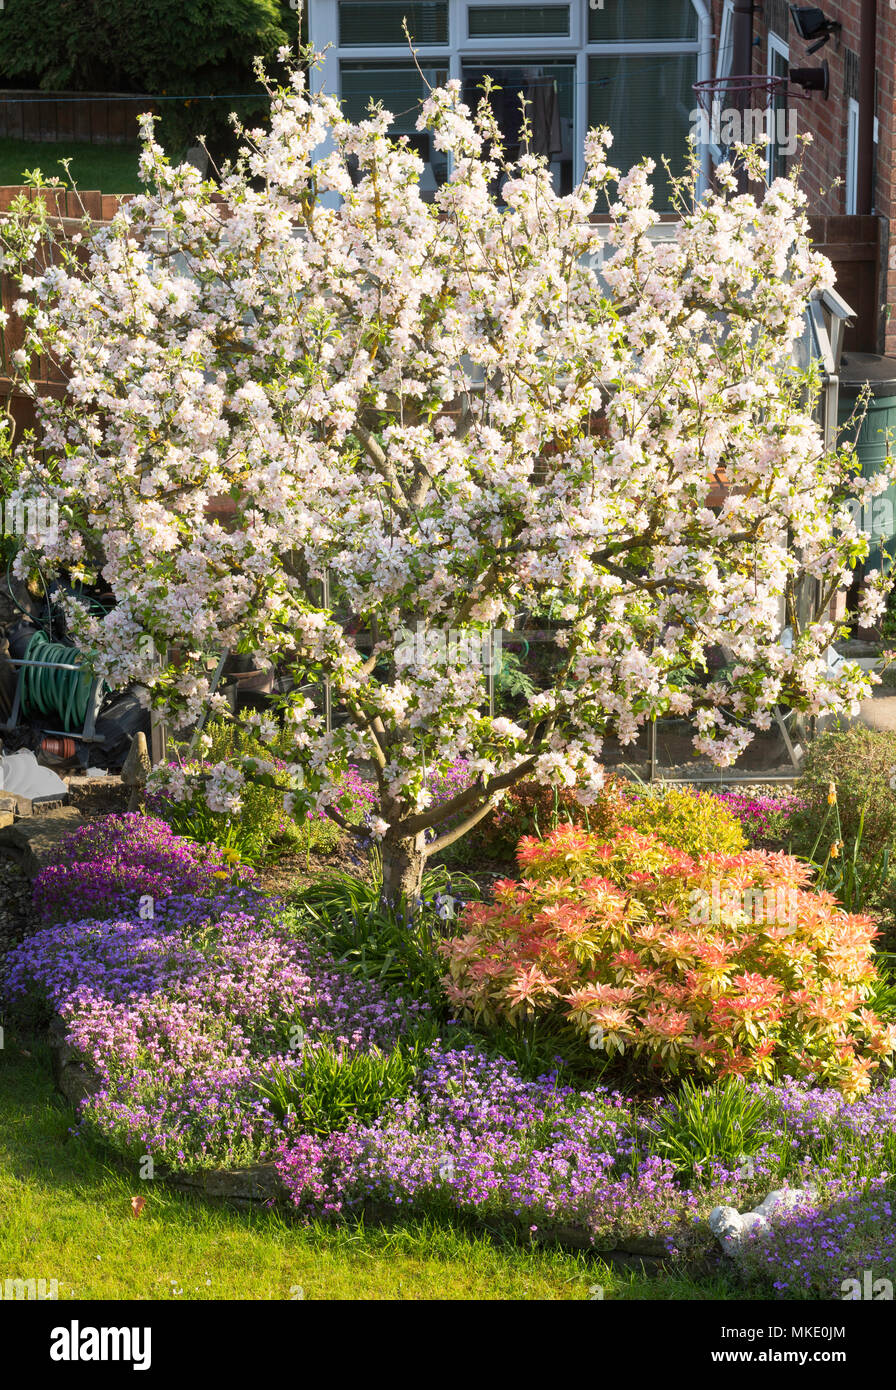 malus-domestica-egremont-russet-flowerin